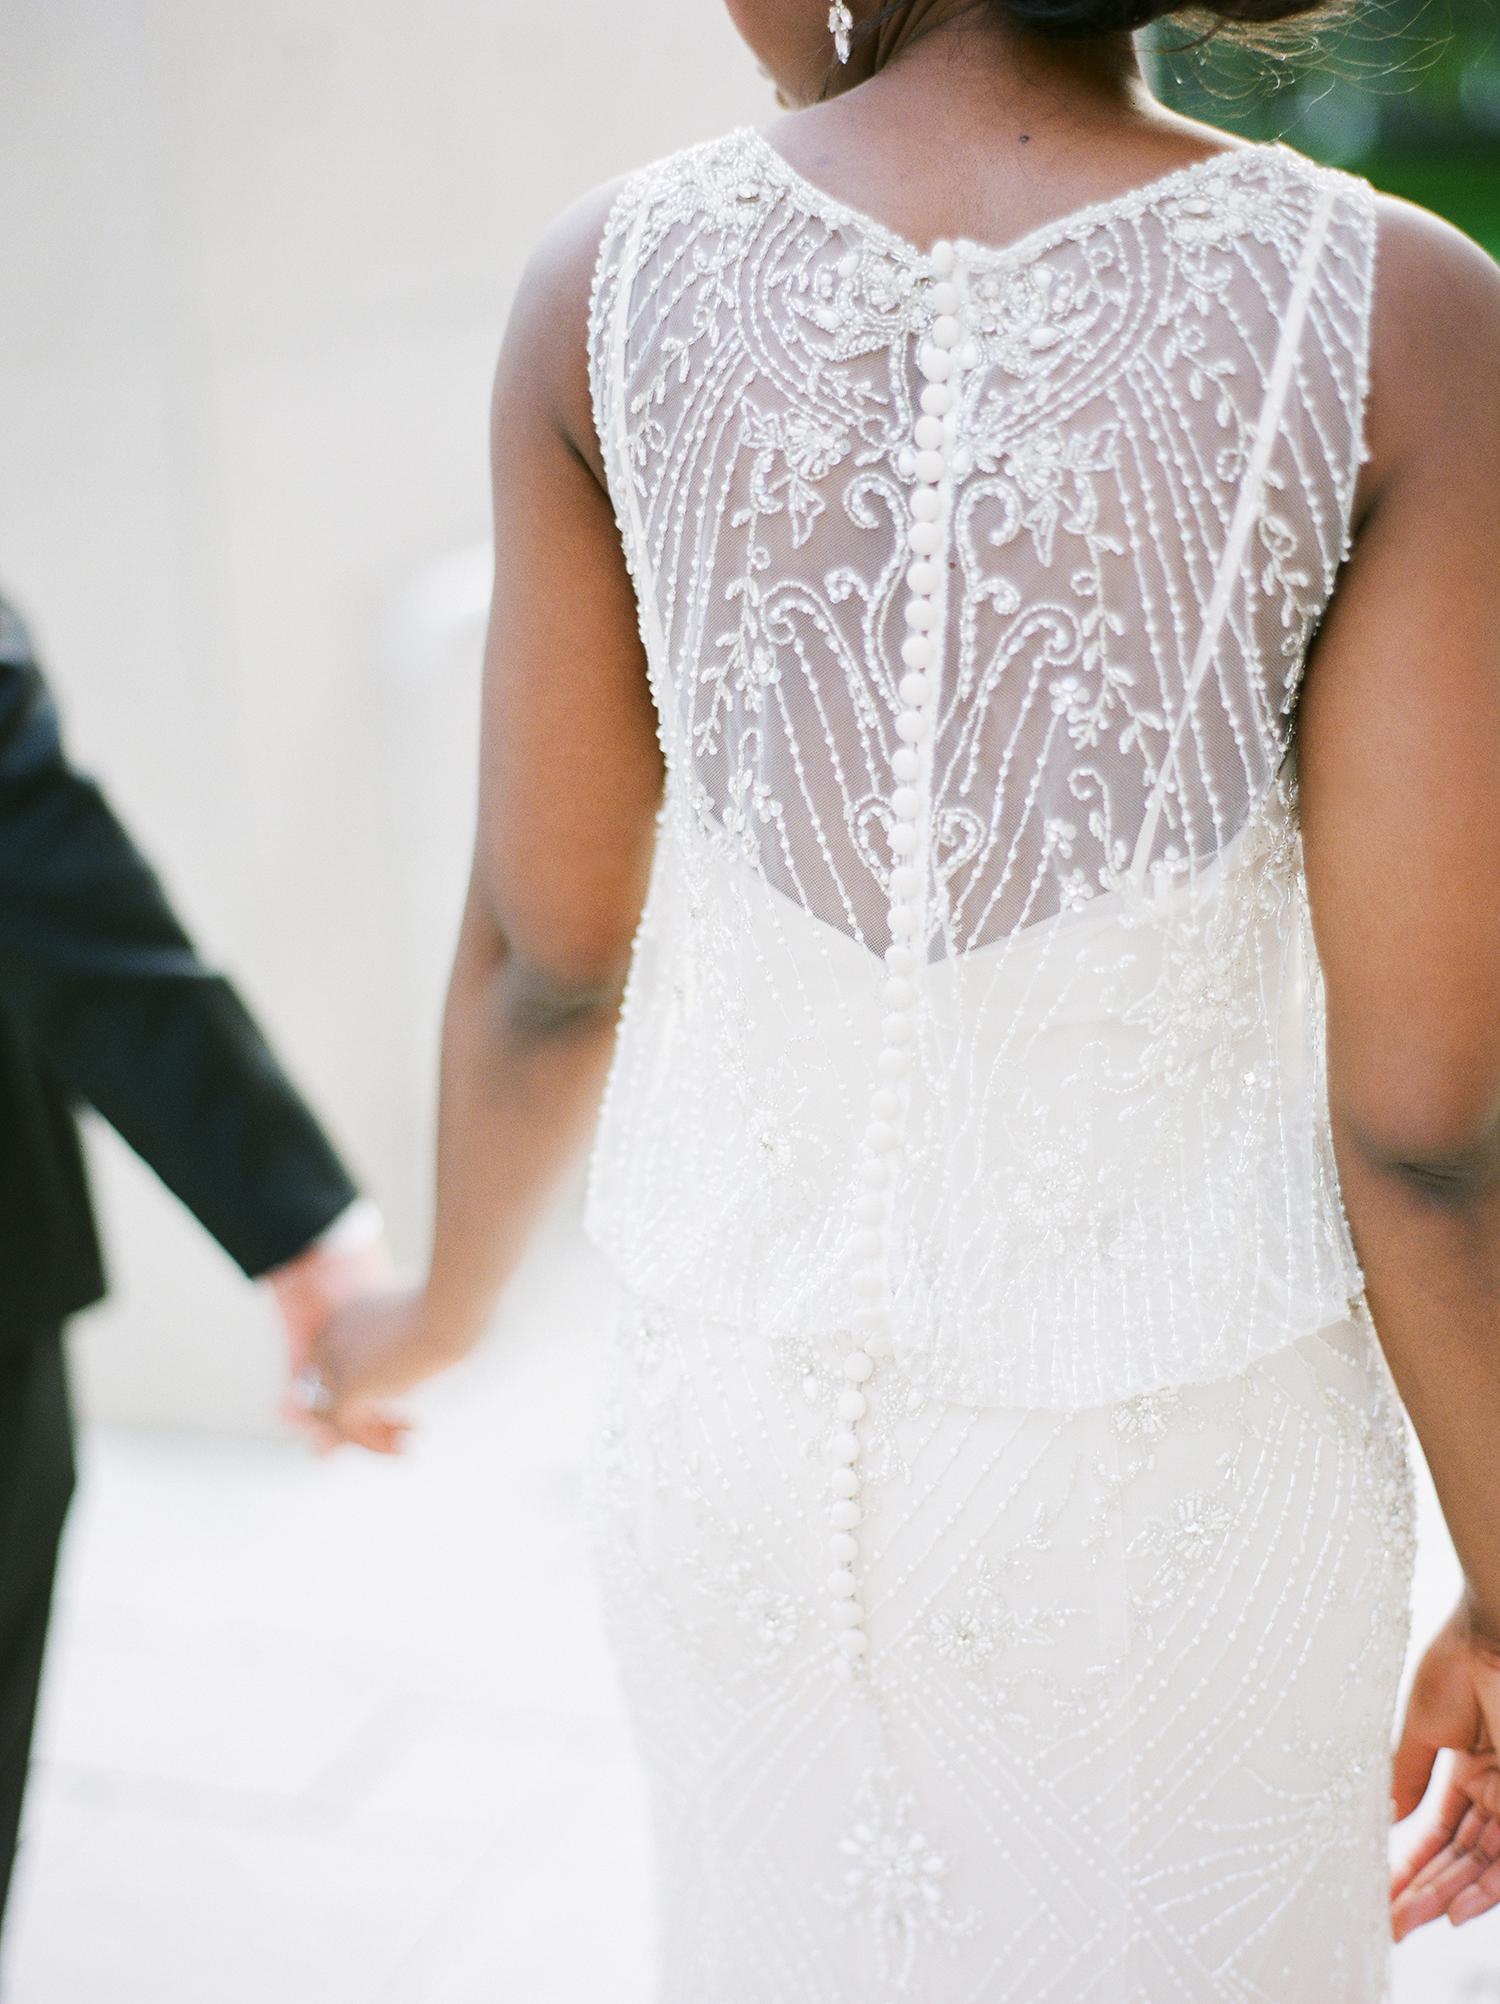 anwuli patrick wedding reception dress